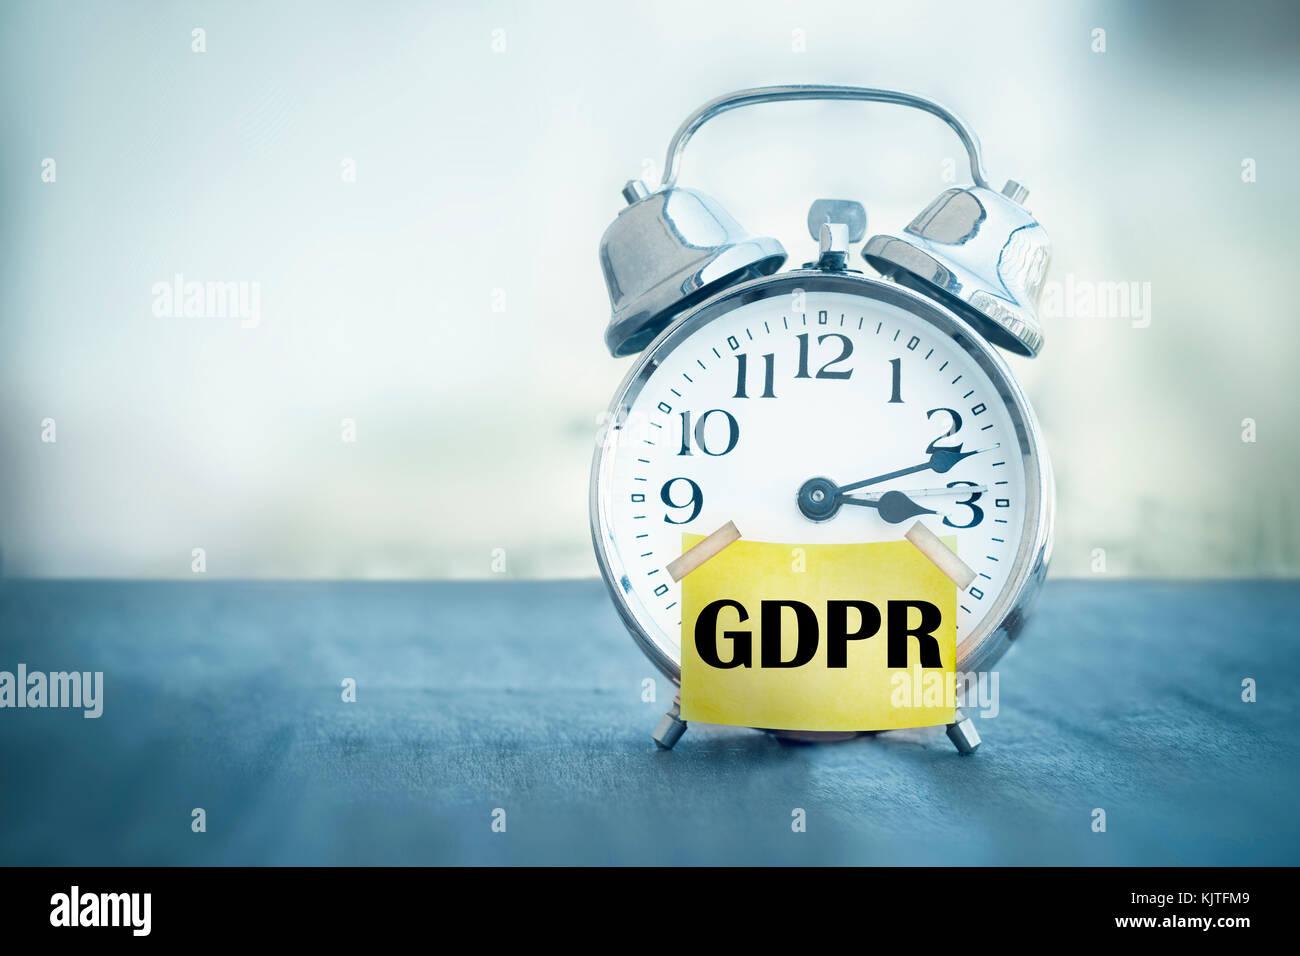 GDPR General Data Protection Regulation alarm clock - Stock Image